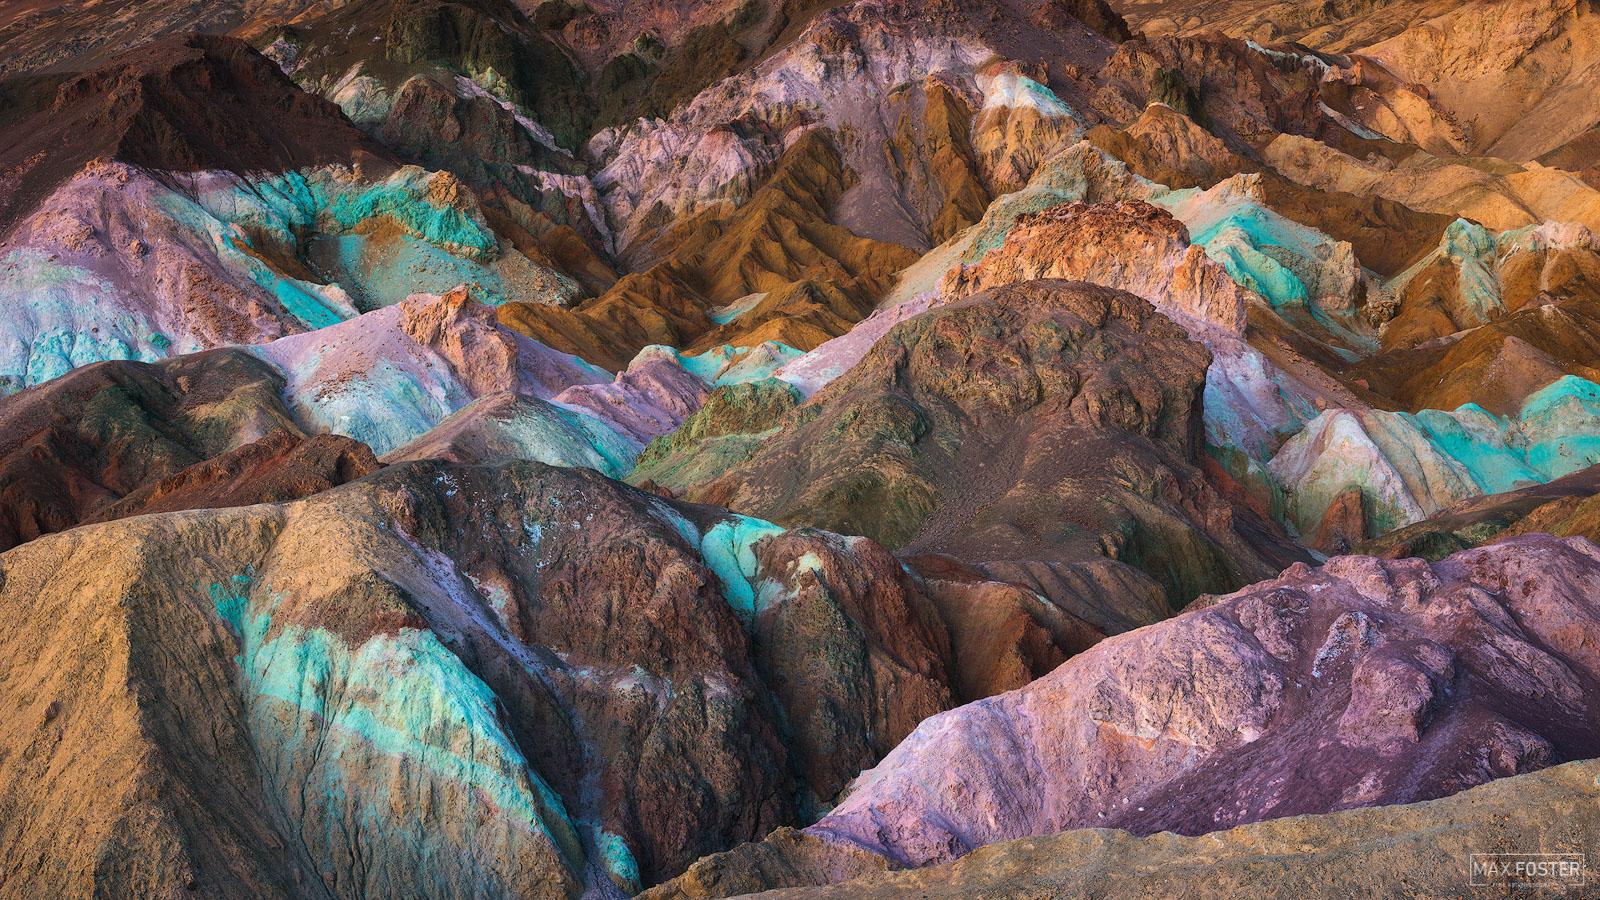 Death Valley National Park, Artist's Palette, California, Badlands, Colorswirl, photo